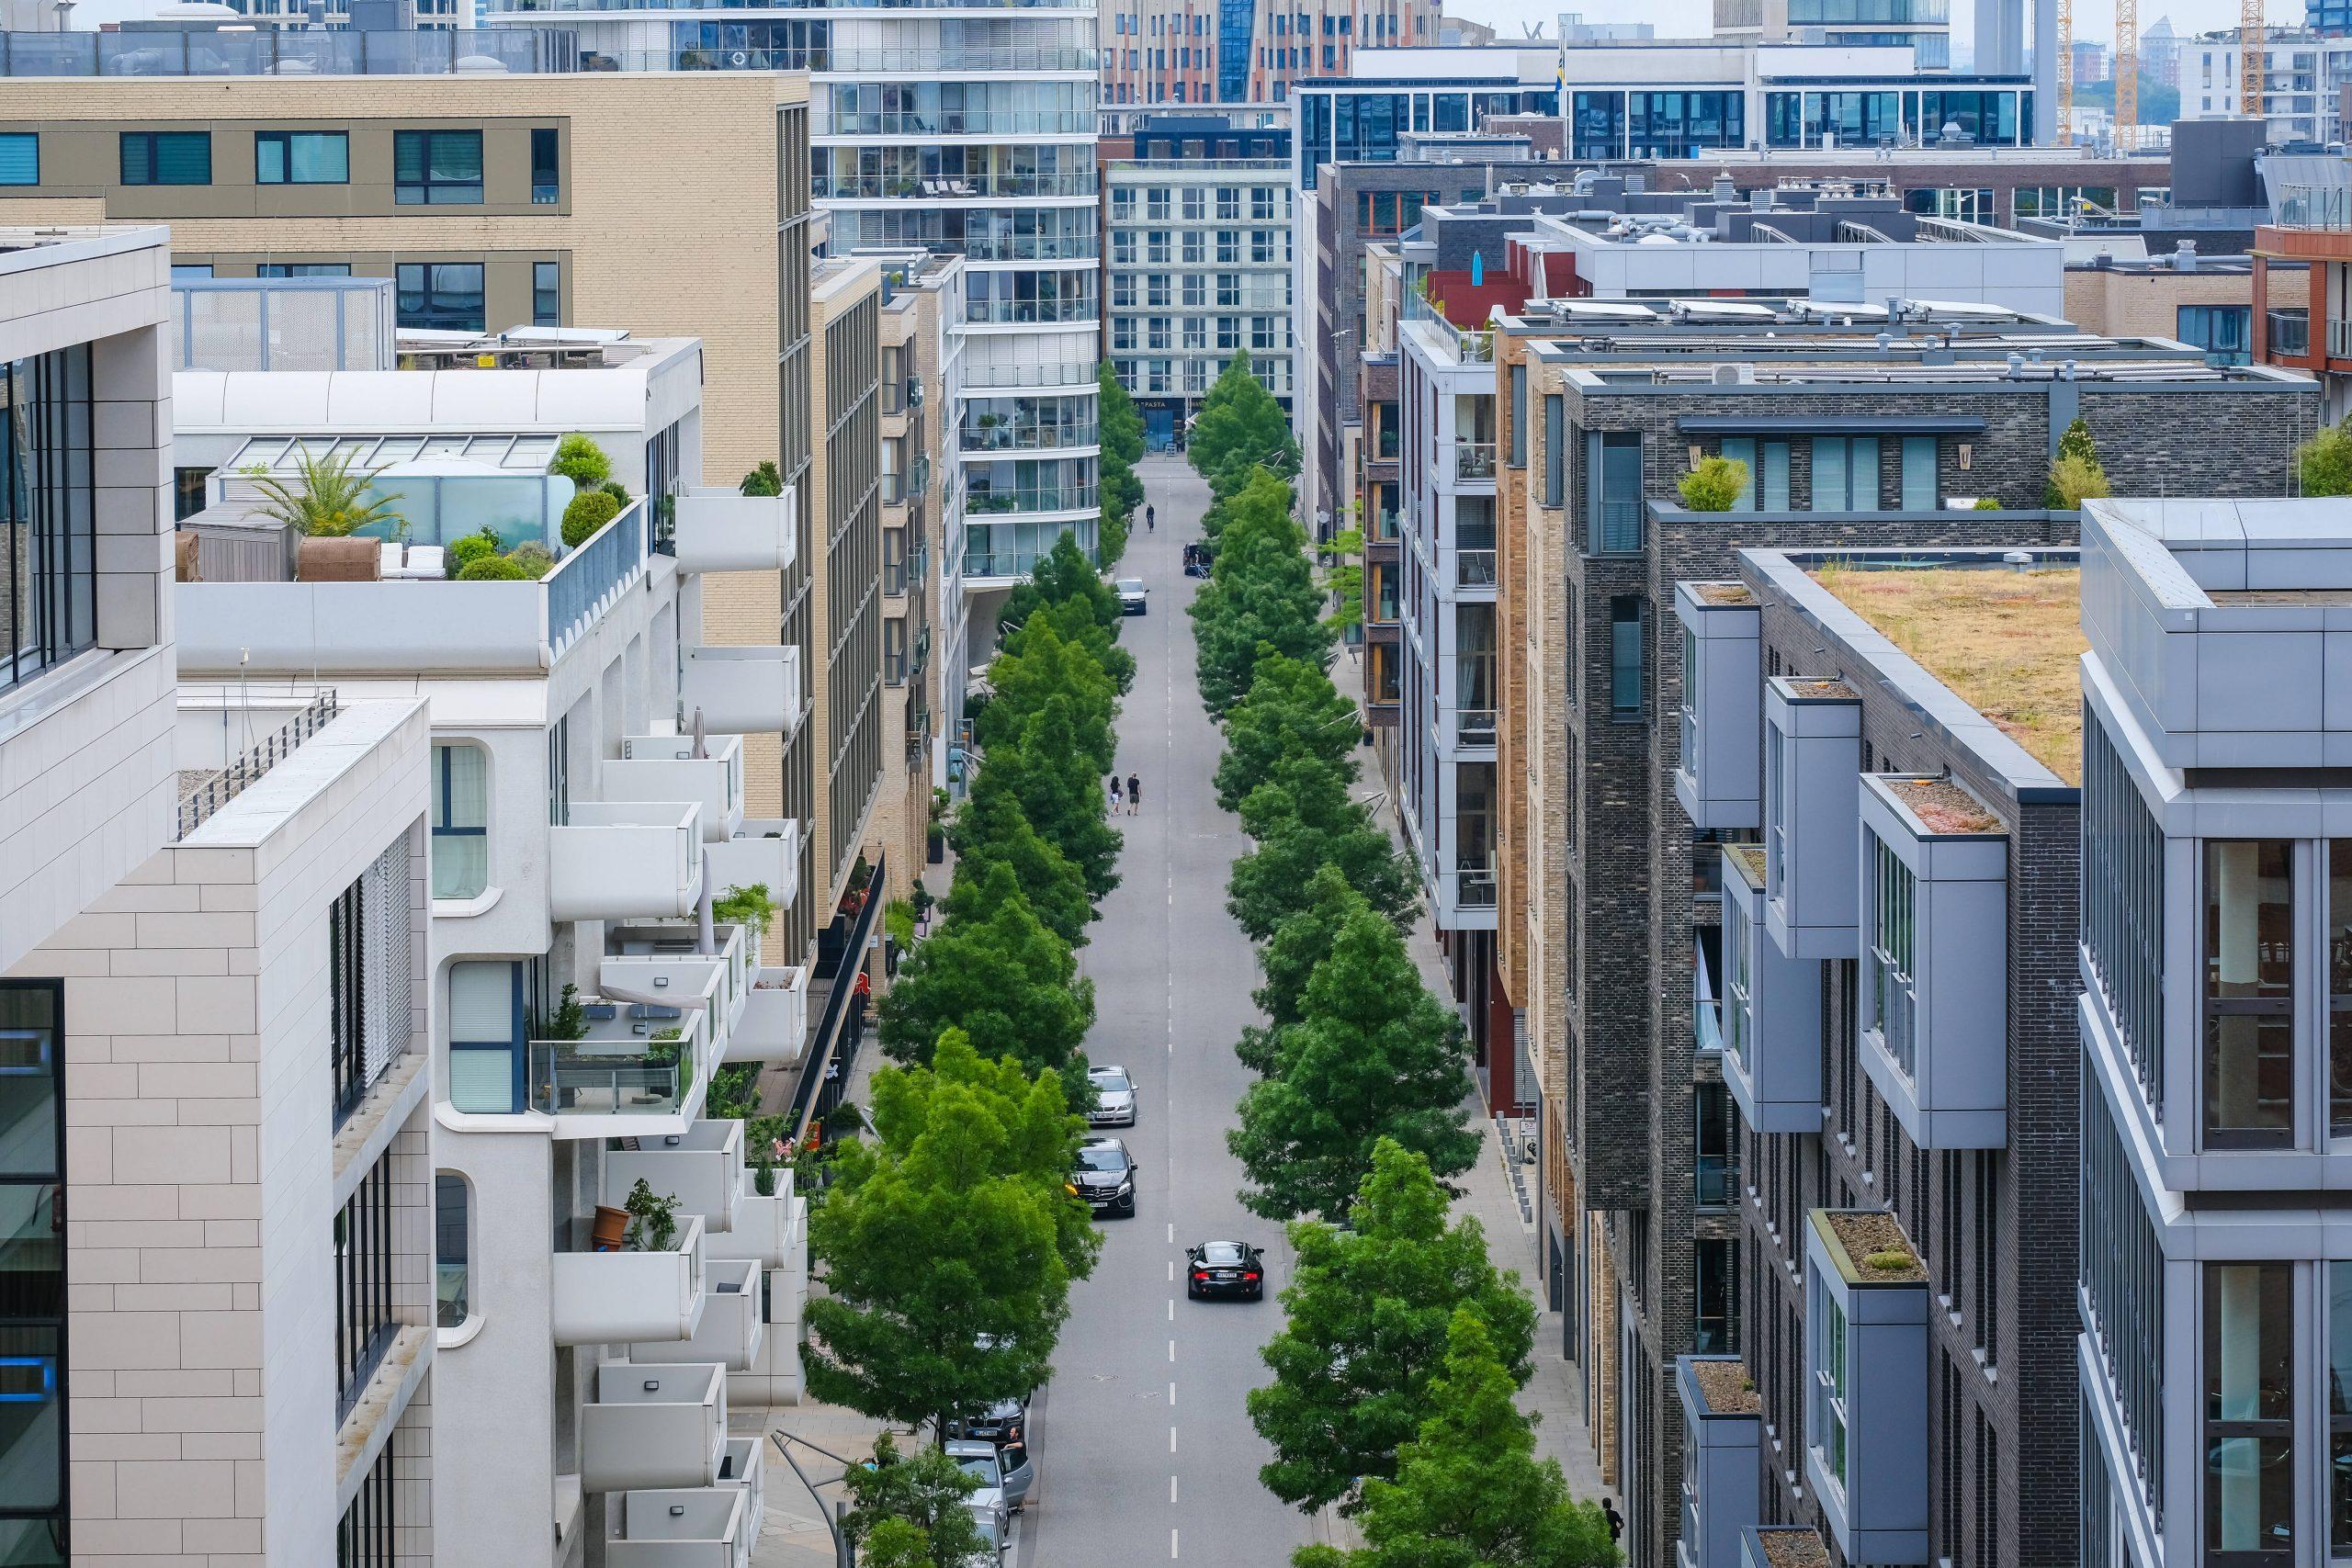 Immobilien: Hier ist Hamburg bereits teurer als München!